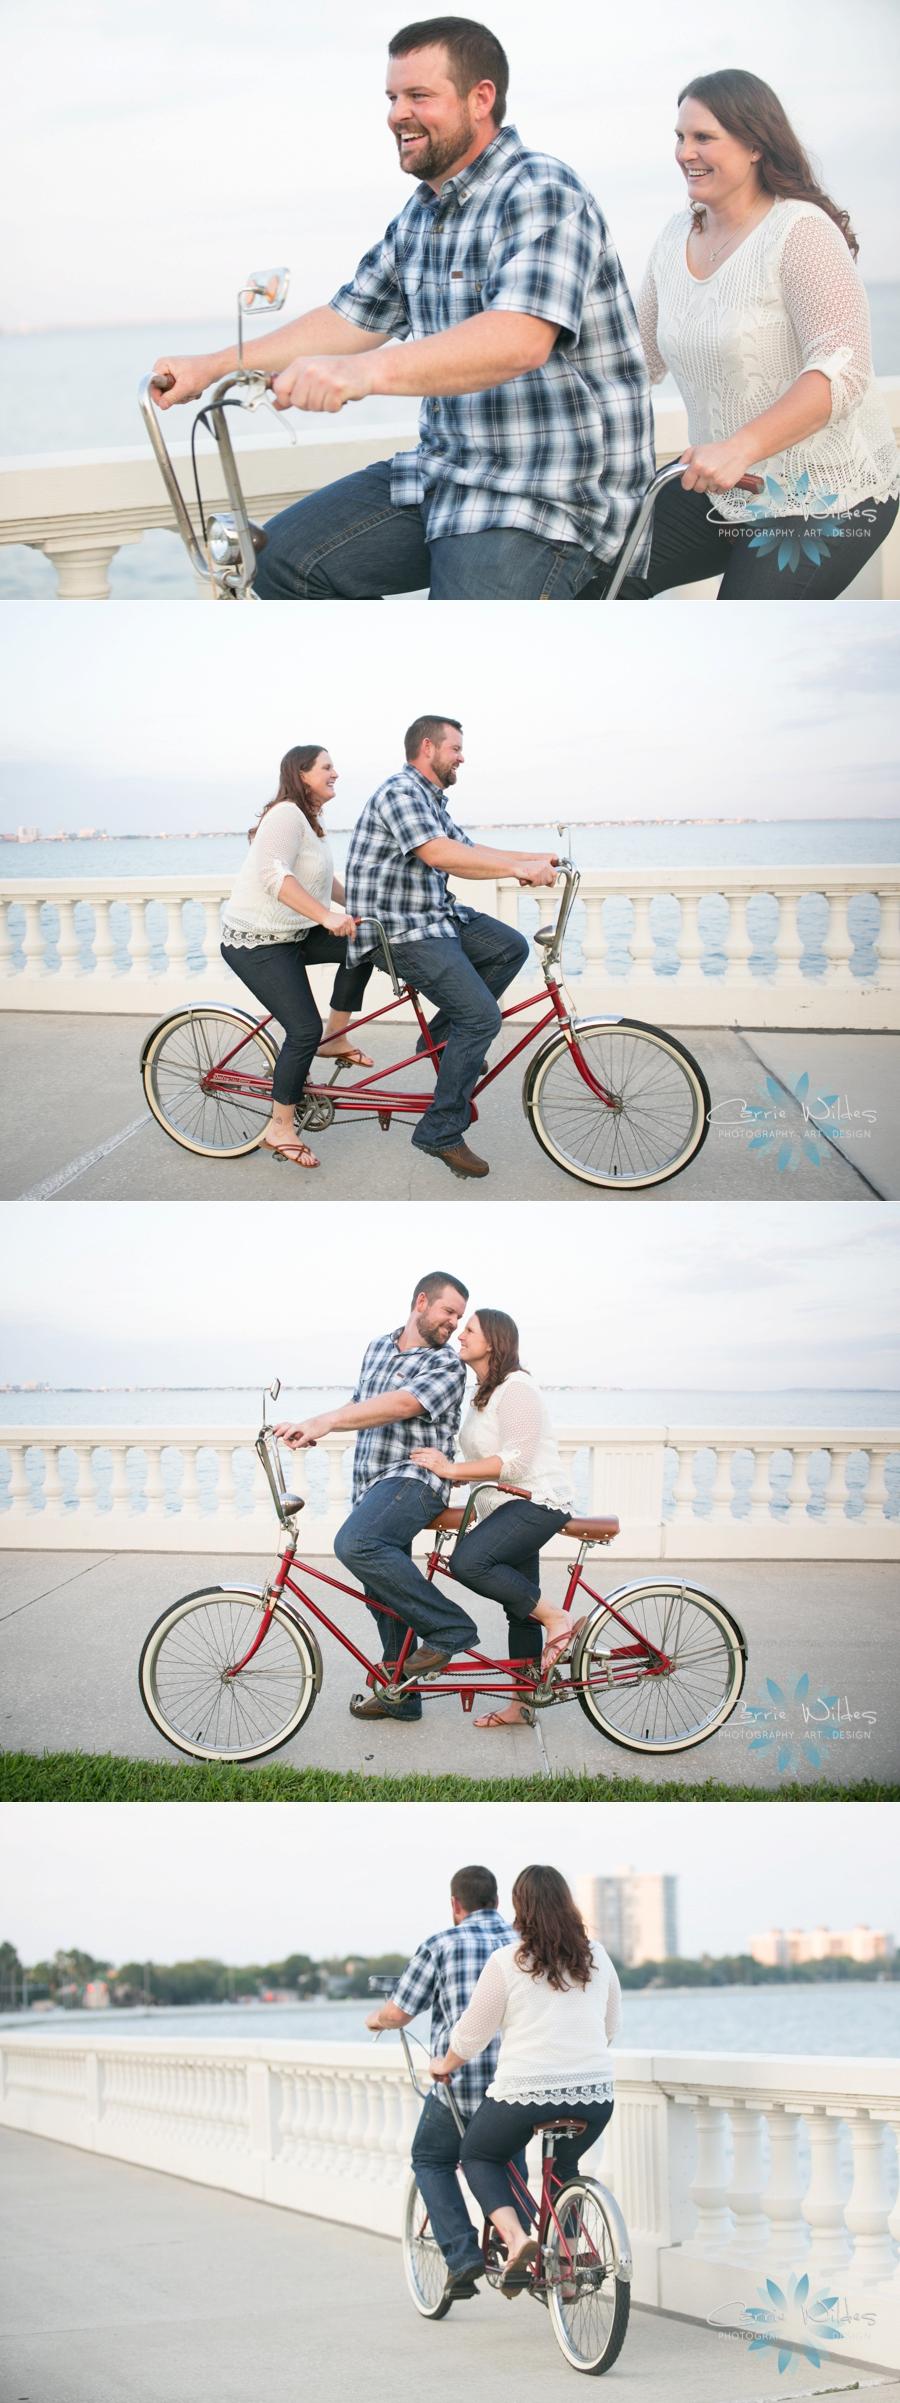 4_9_18 Christine and Matt Bayshore Blvd Tampa Engagement Session_0004.jpg